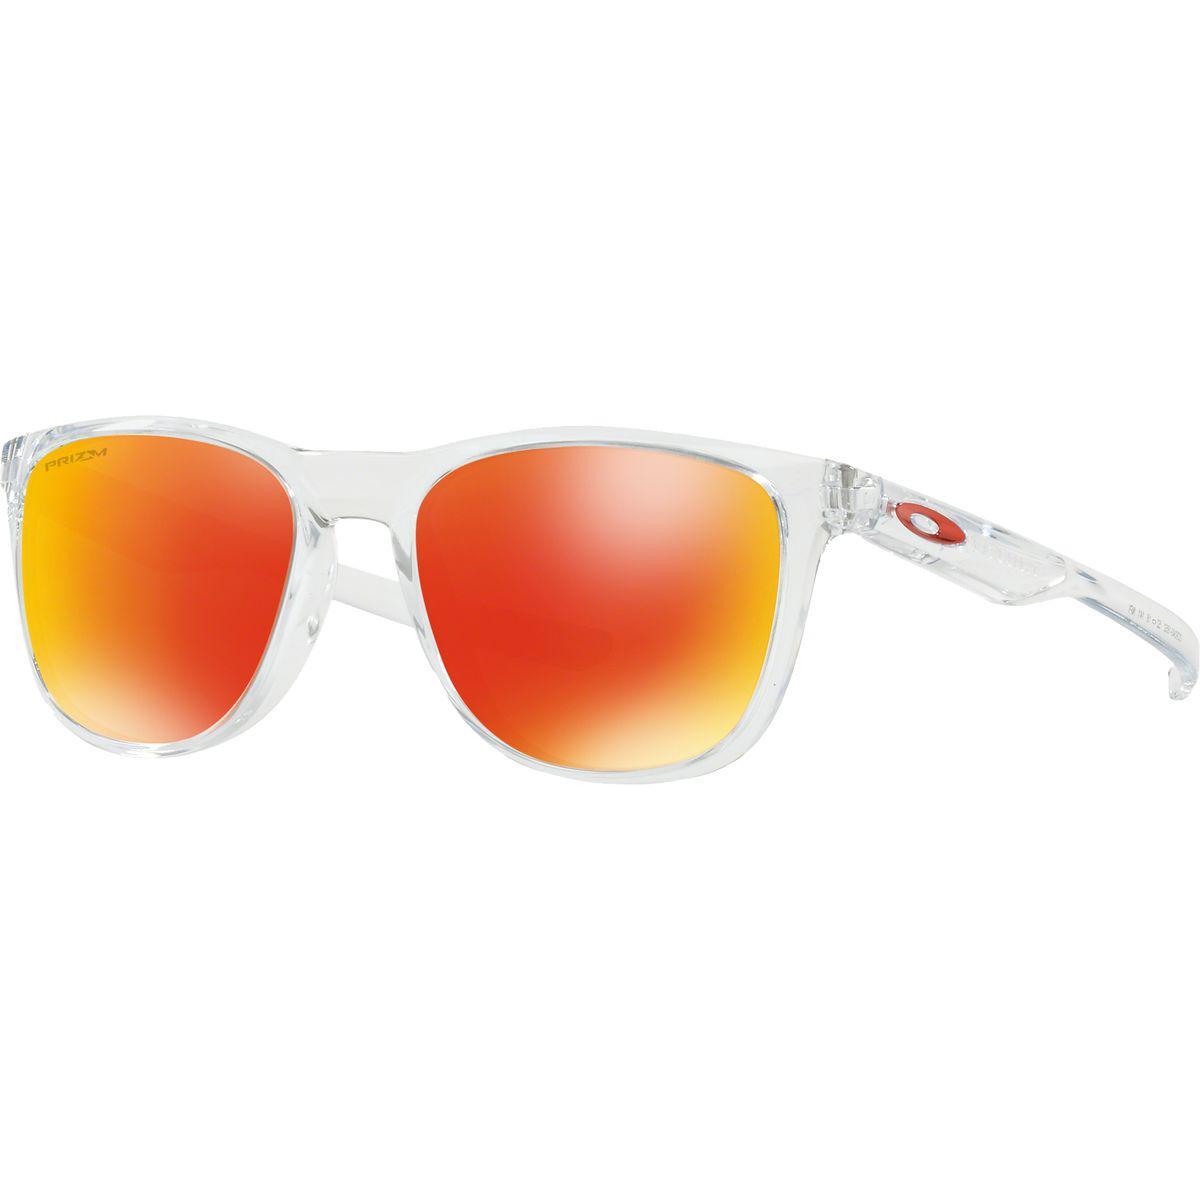 66f50aa736 Lyst - Oakley Trillbe X Prizm Sunglasses in White for Men